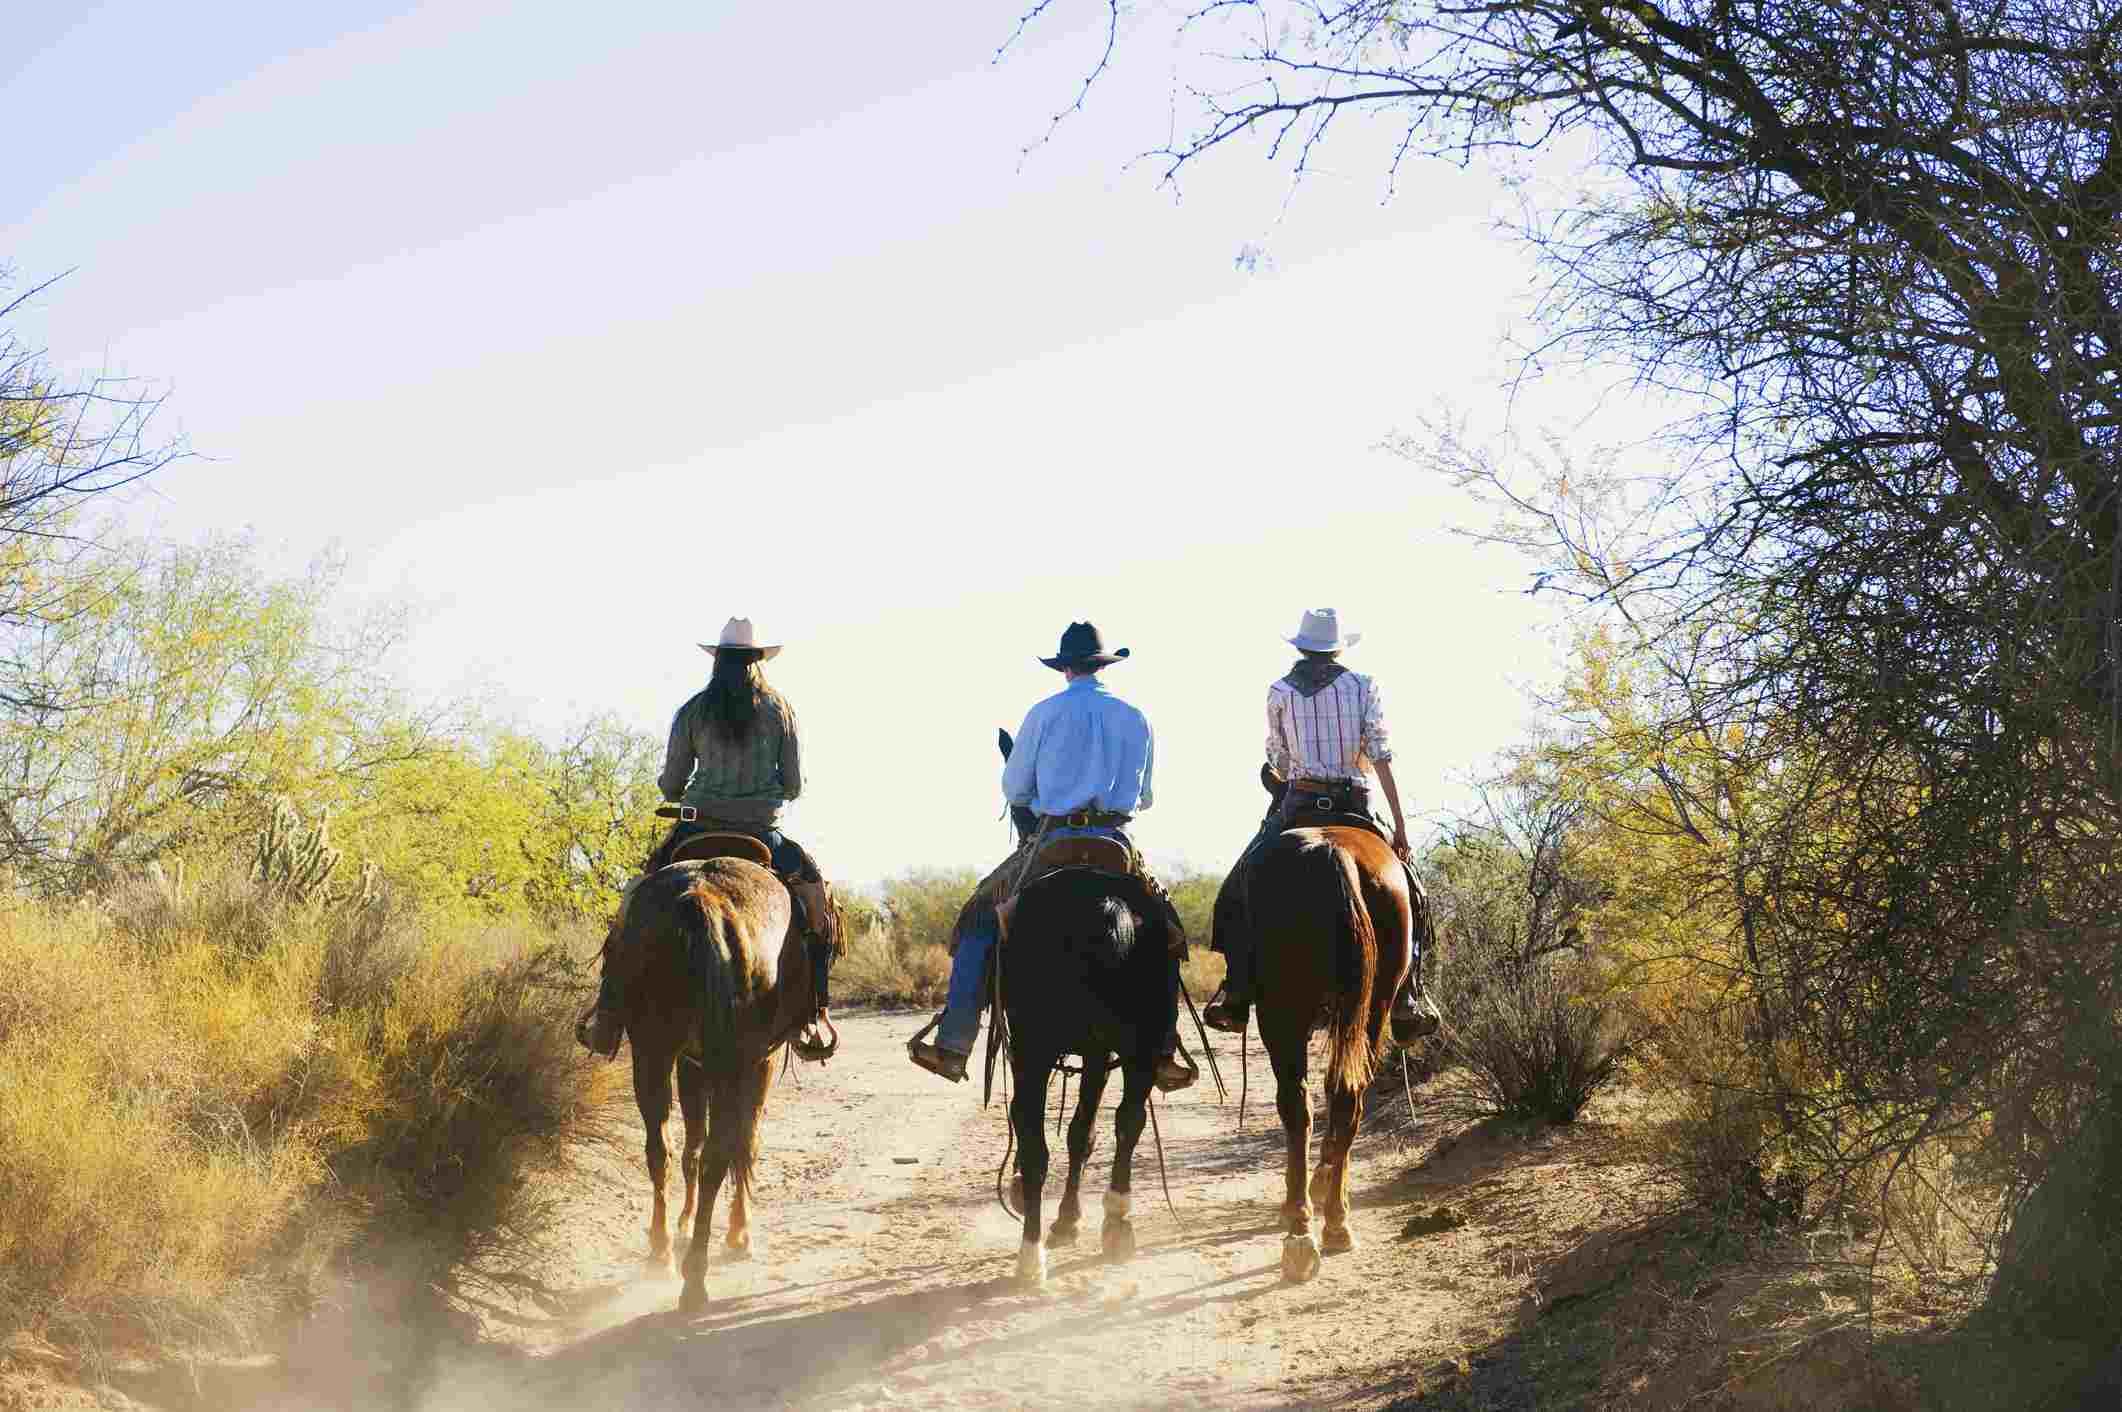 Ranchers riding horses